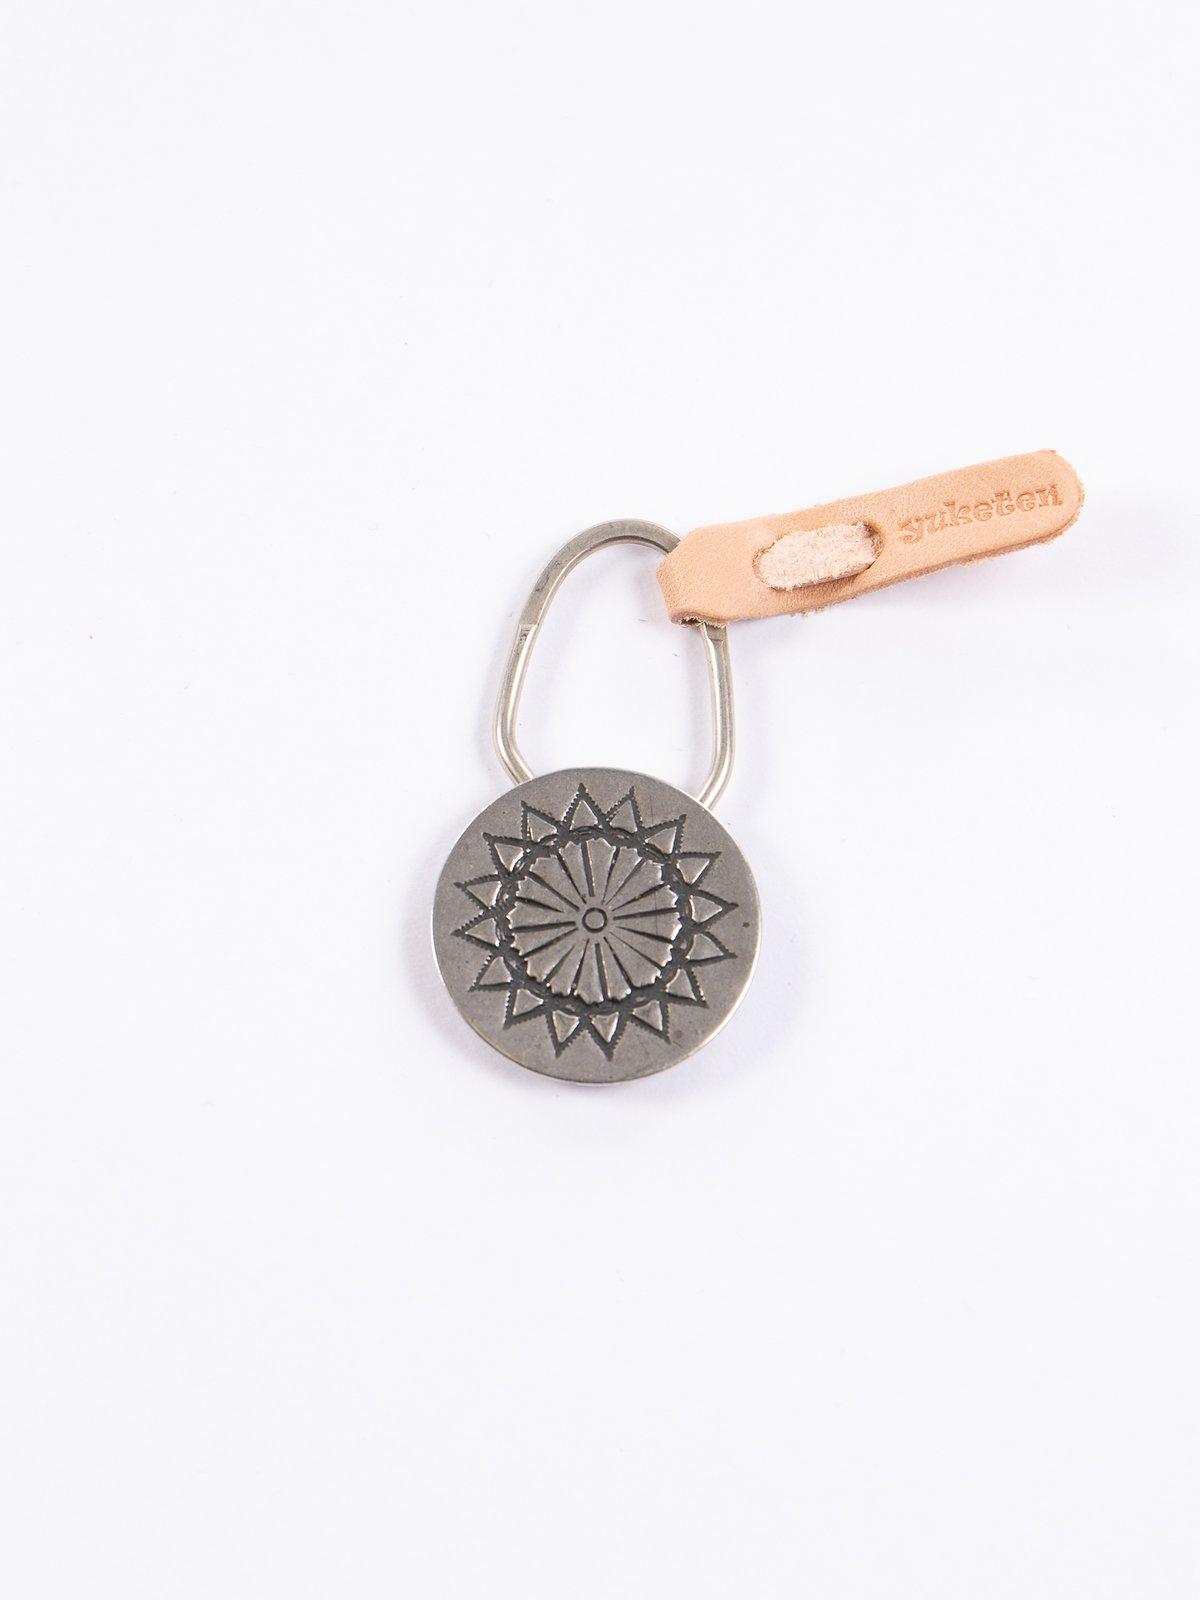 Nickel Silver Sun Flower Concho Keychain - Image 1